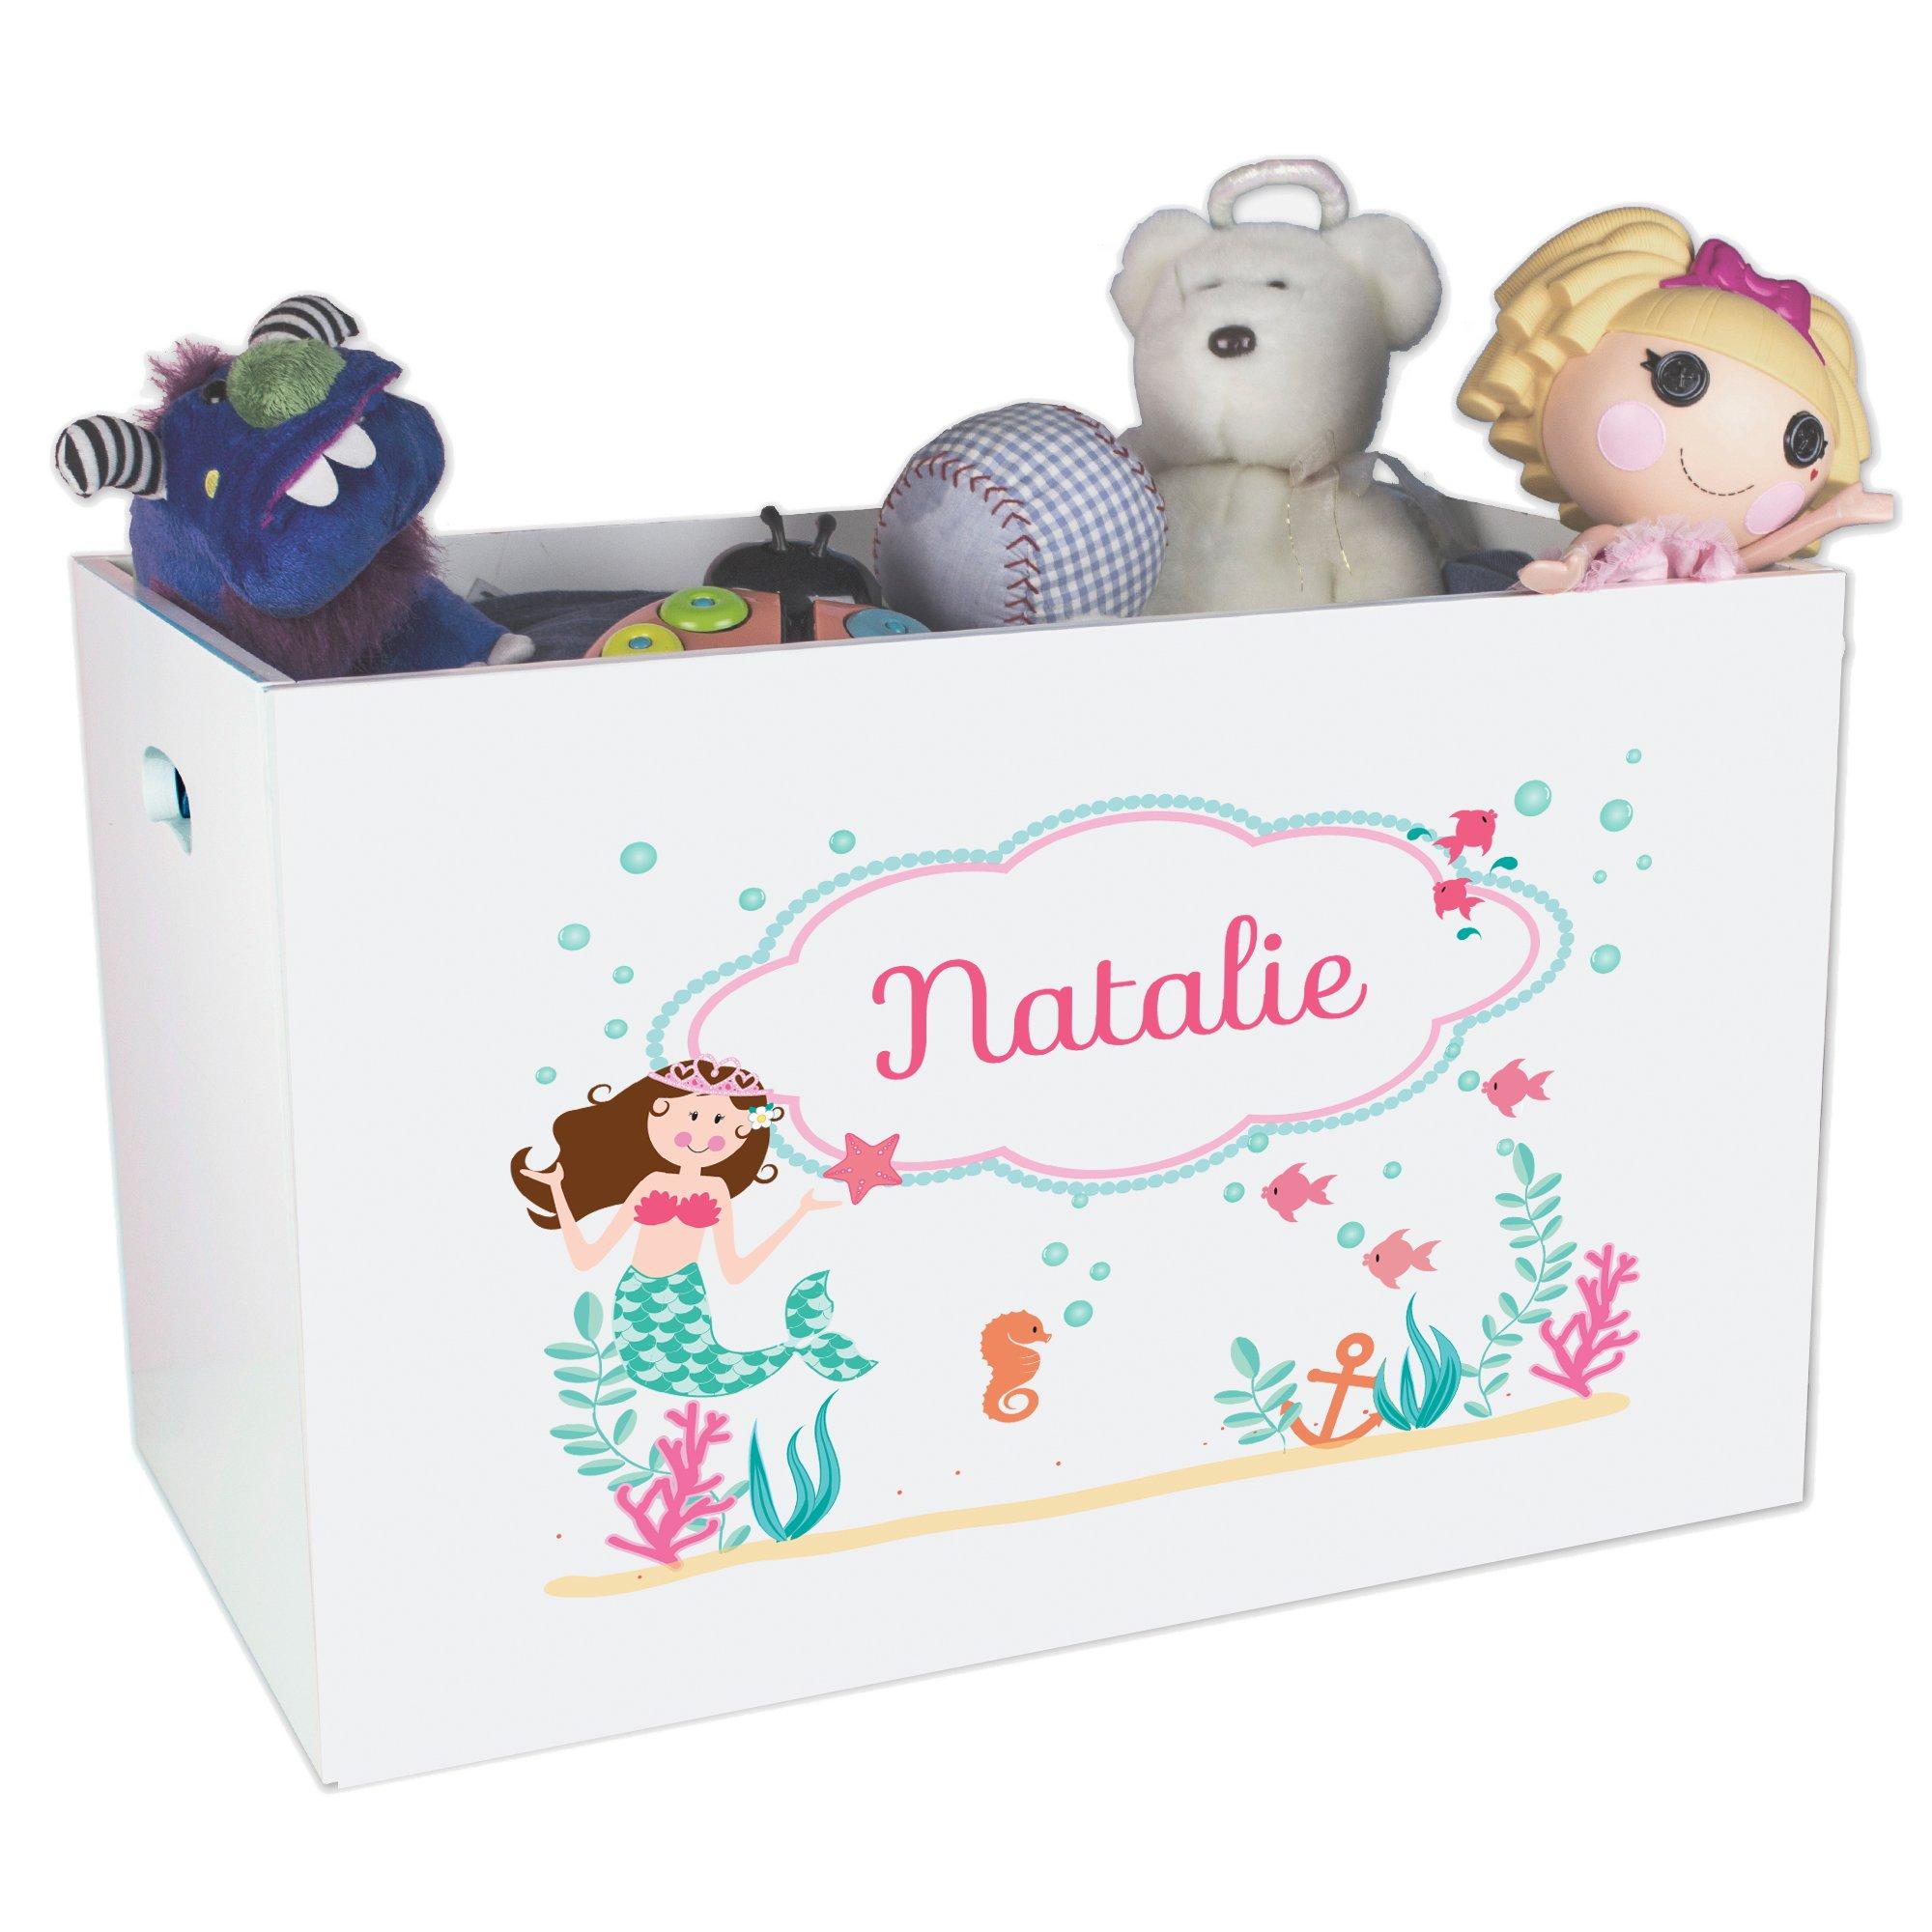 Personalized Mermaid Nursery White Open Toy Box